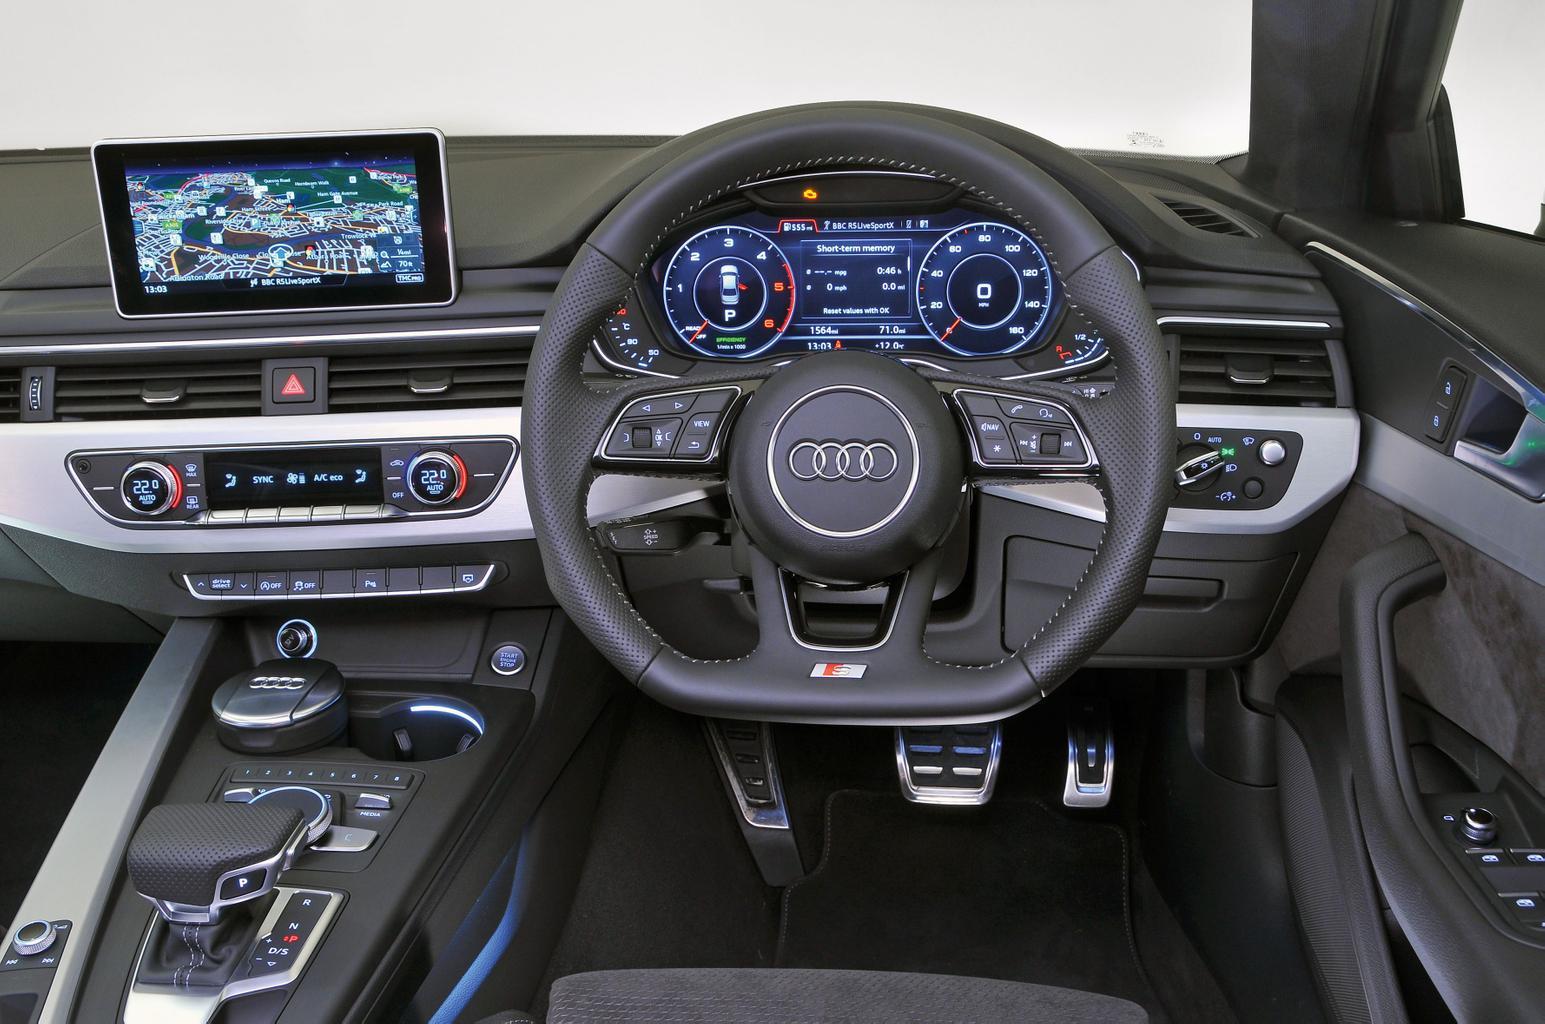 Used test: Audi A4 vs BMW 3 Series